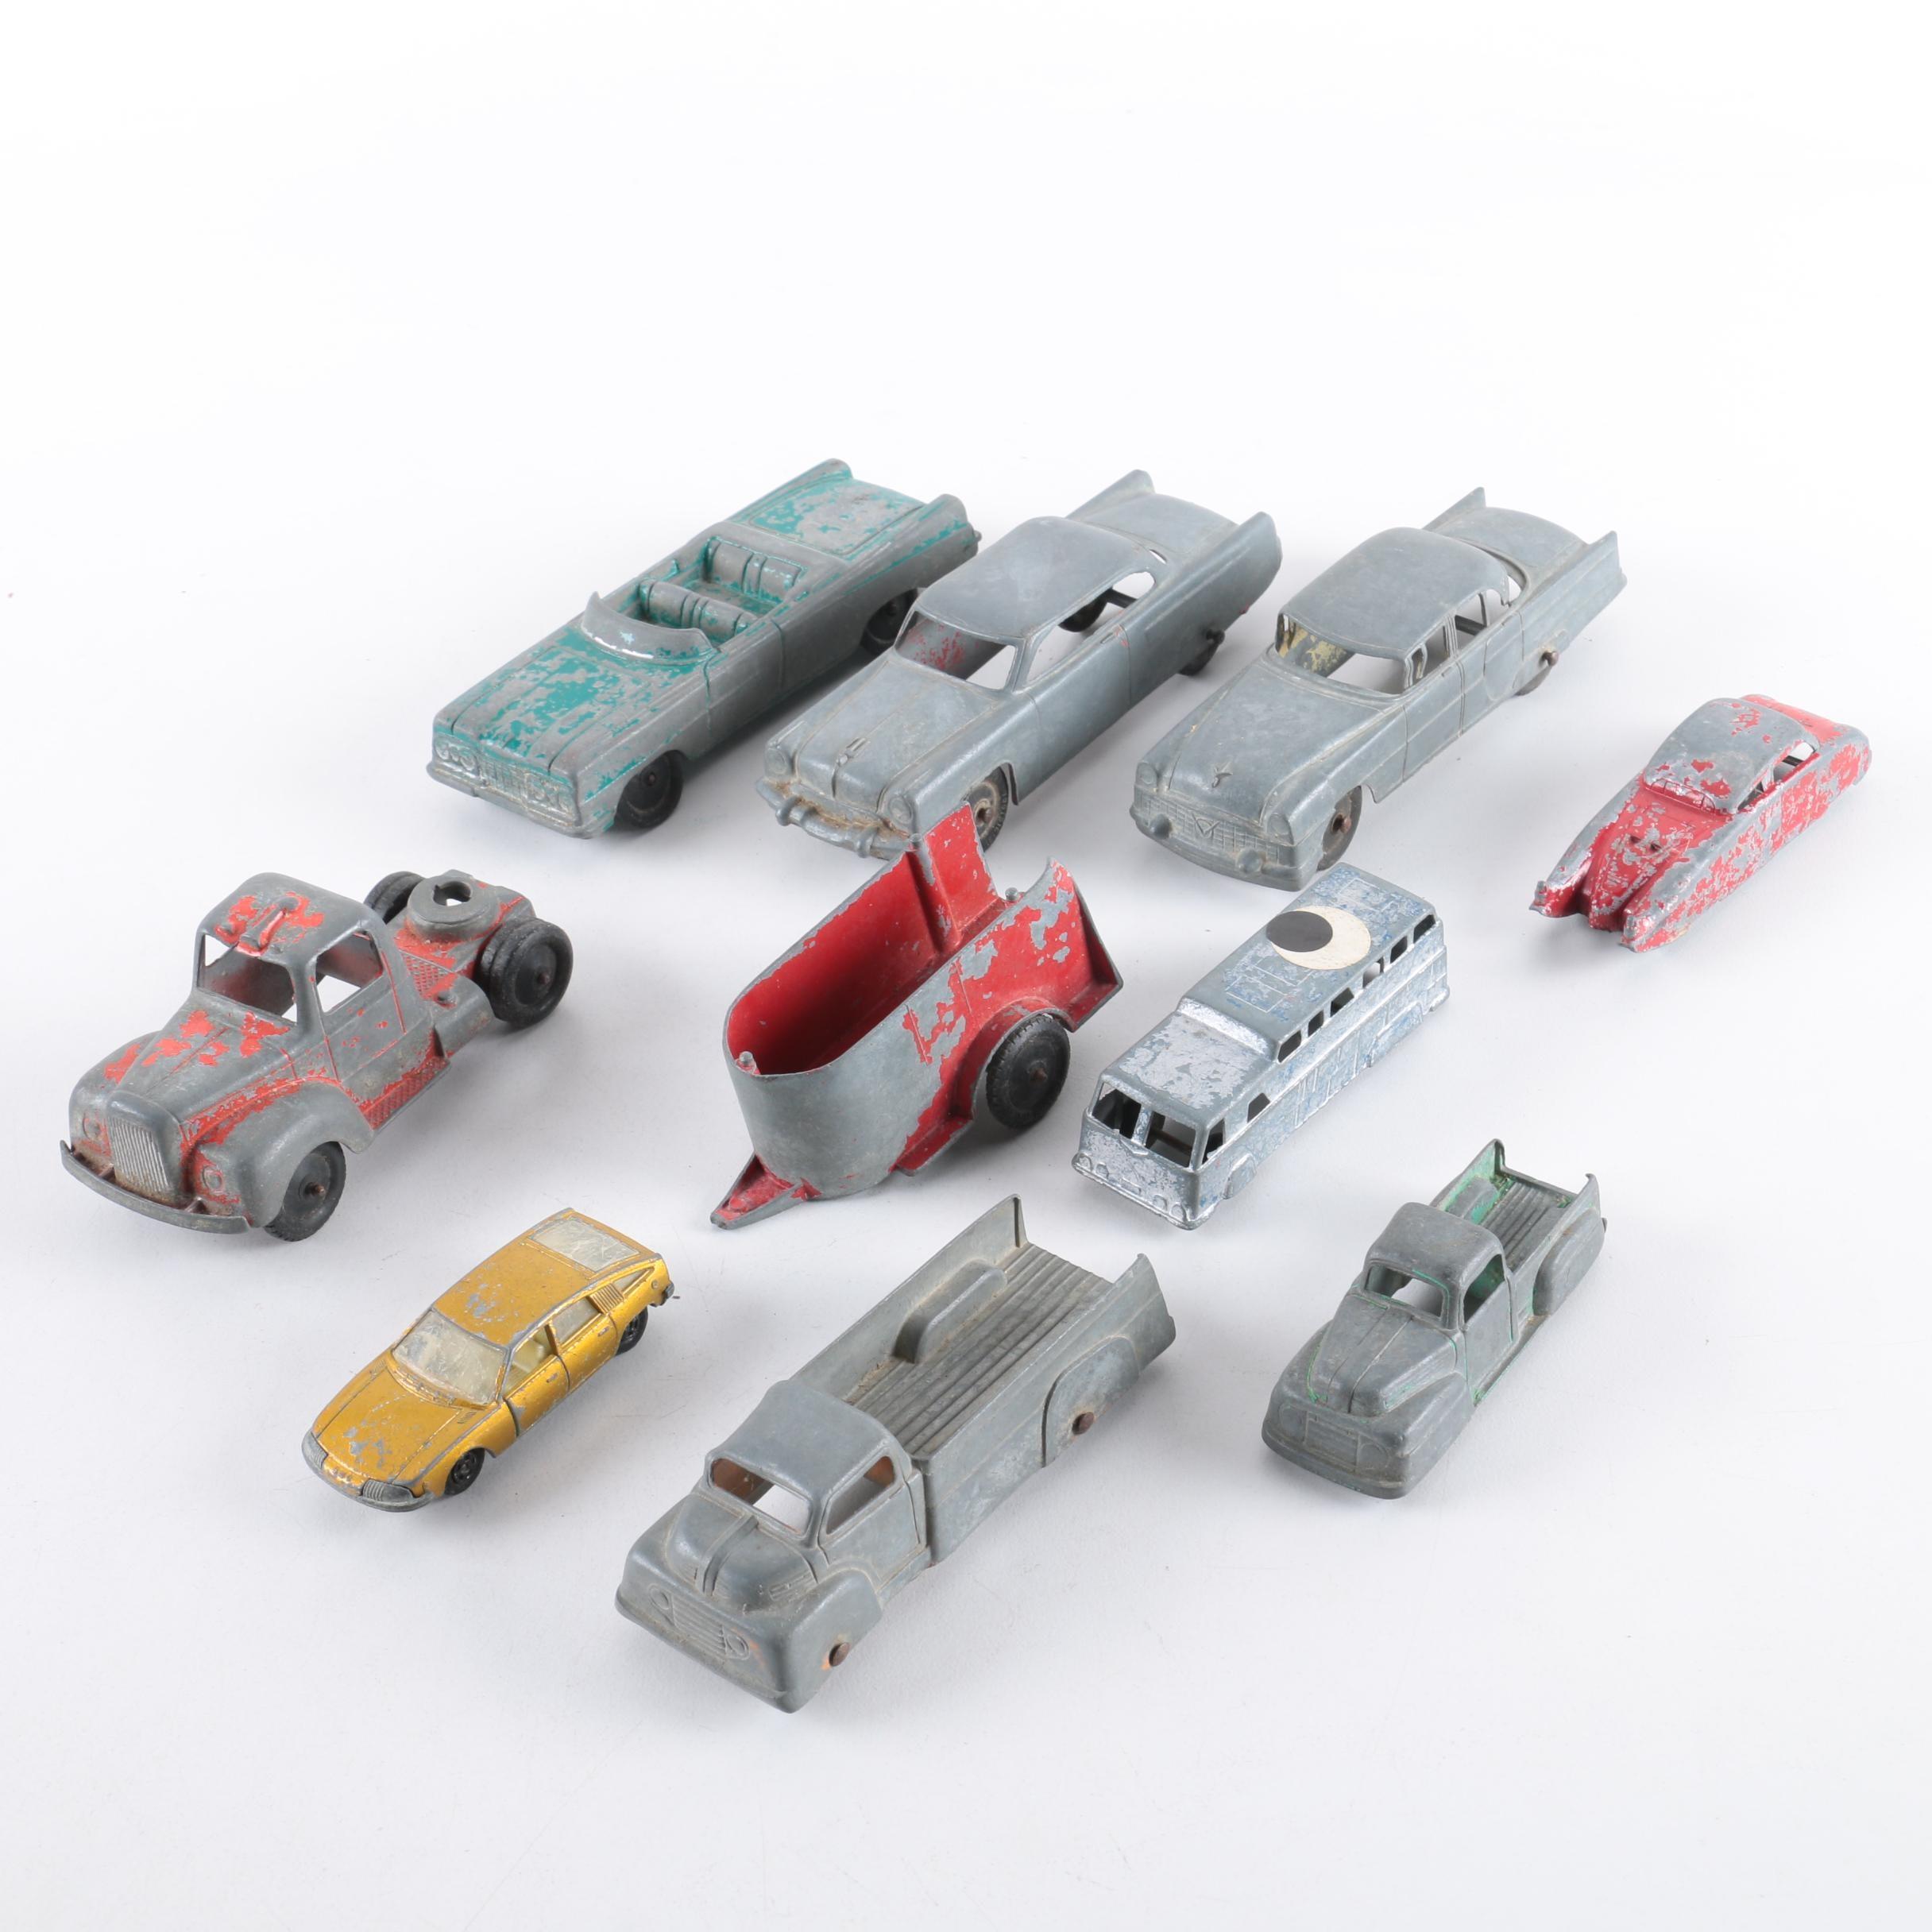 Vintage Die-Cast Cars and Trucks Including Midge